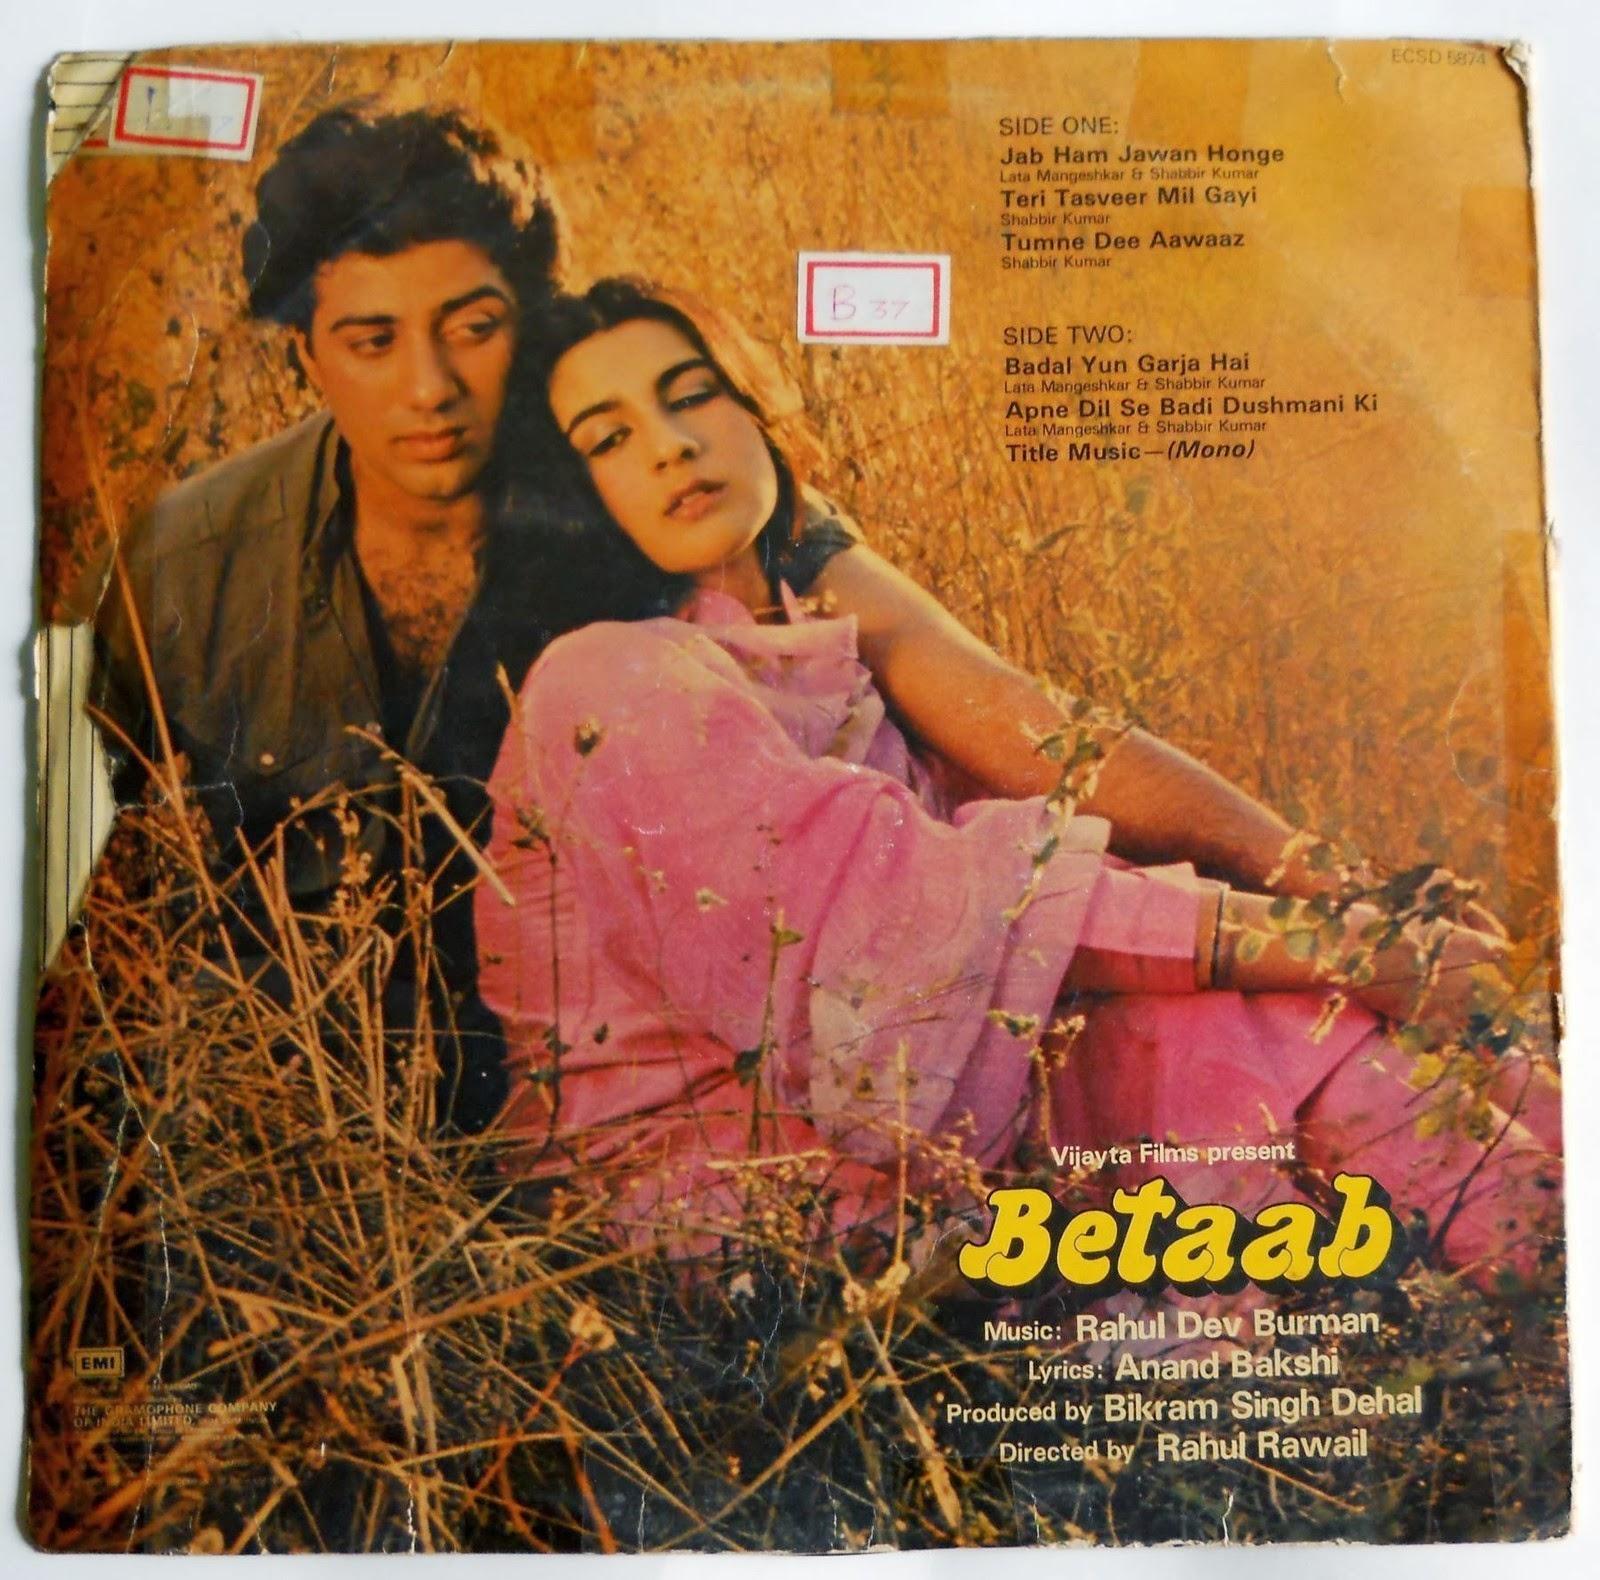 Jugnu hindi movie part 2 / Screenrush trailers